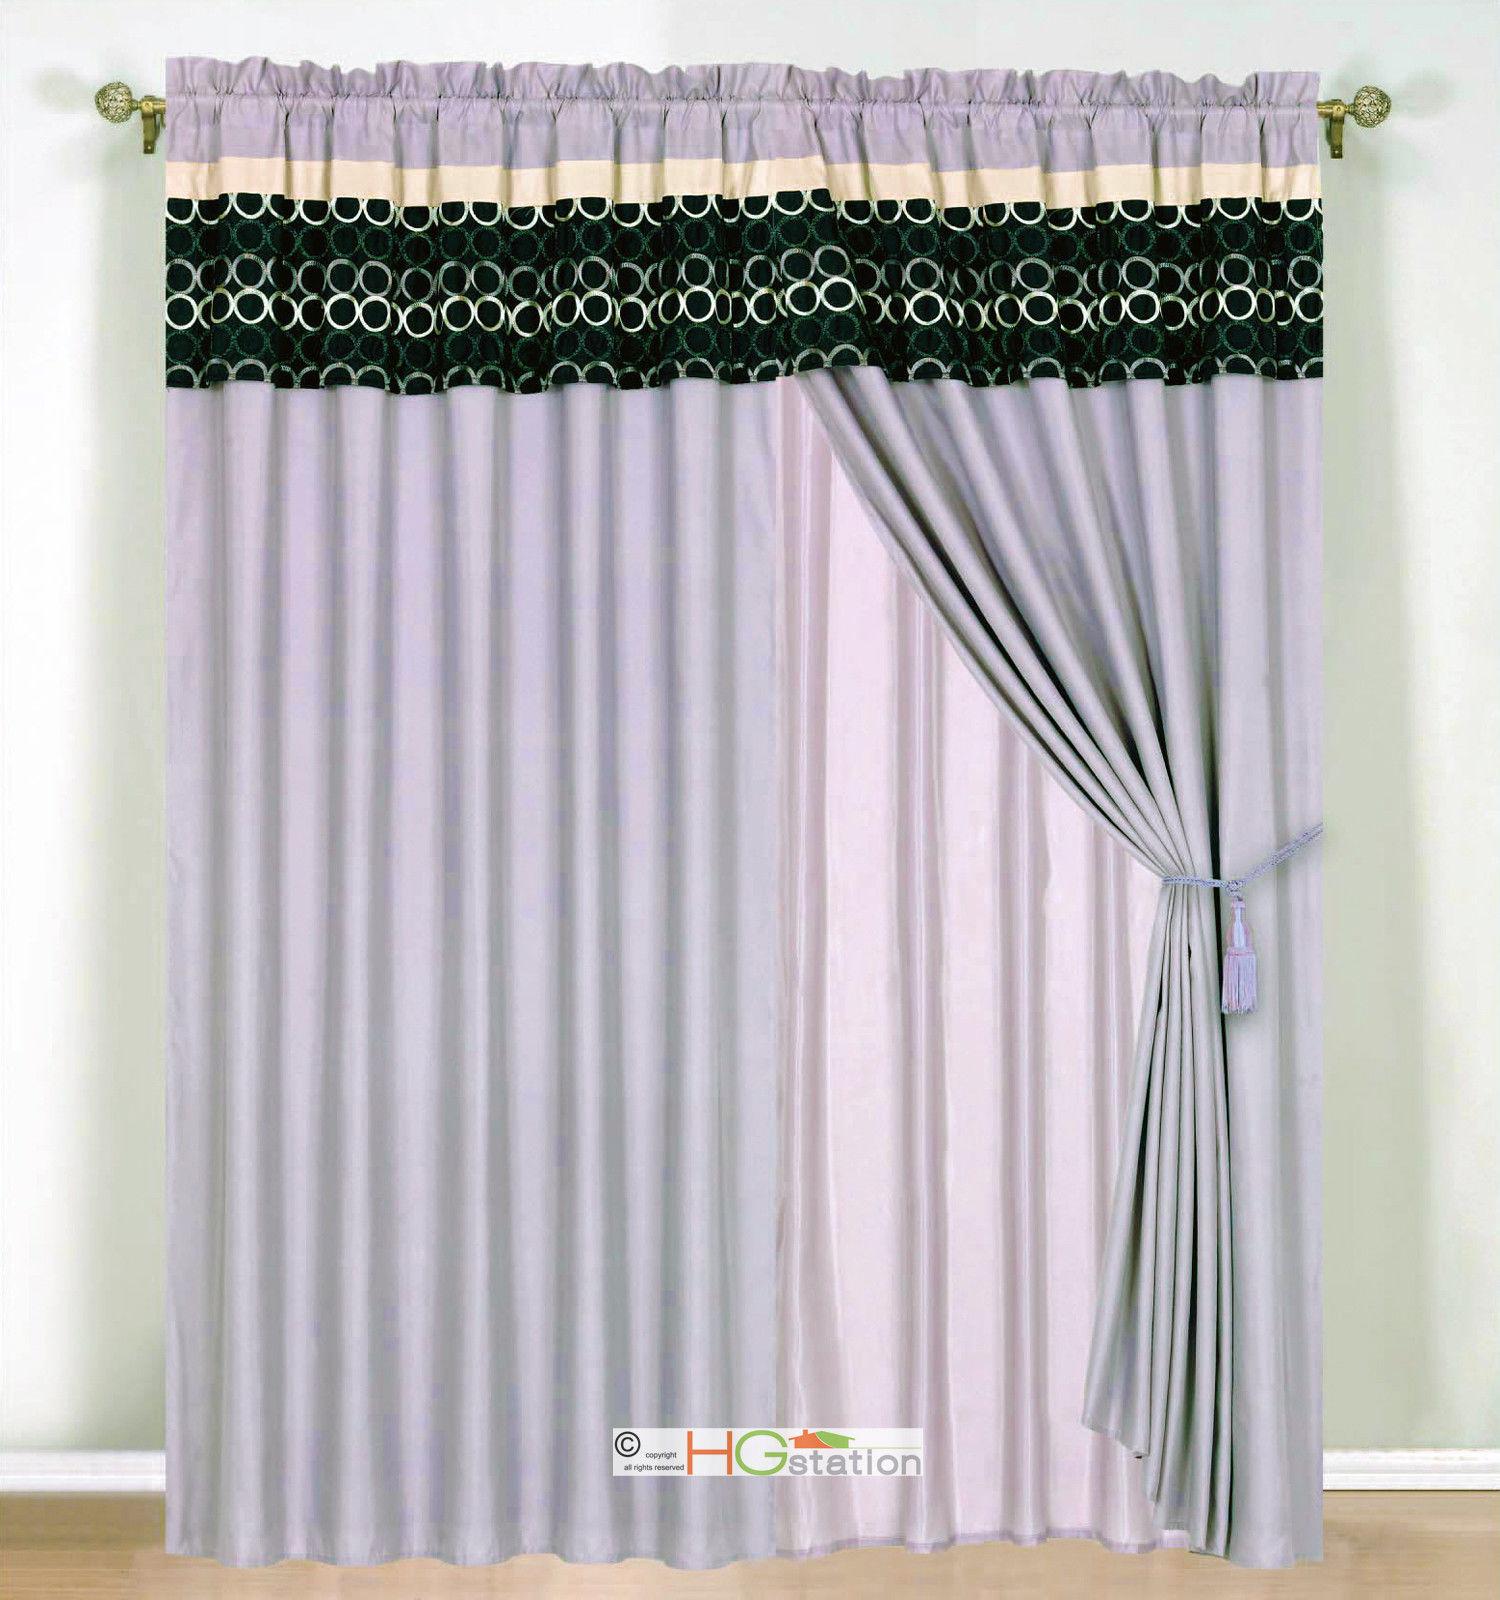 4-Pc Circle Embroidery Striped Curtain Set Lavender Black Beige Valance Drape - $40.89